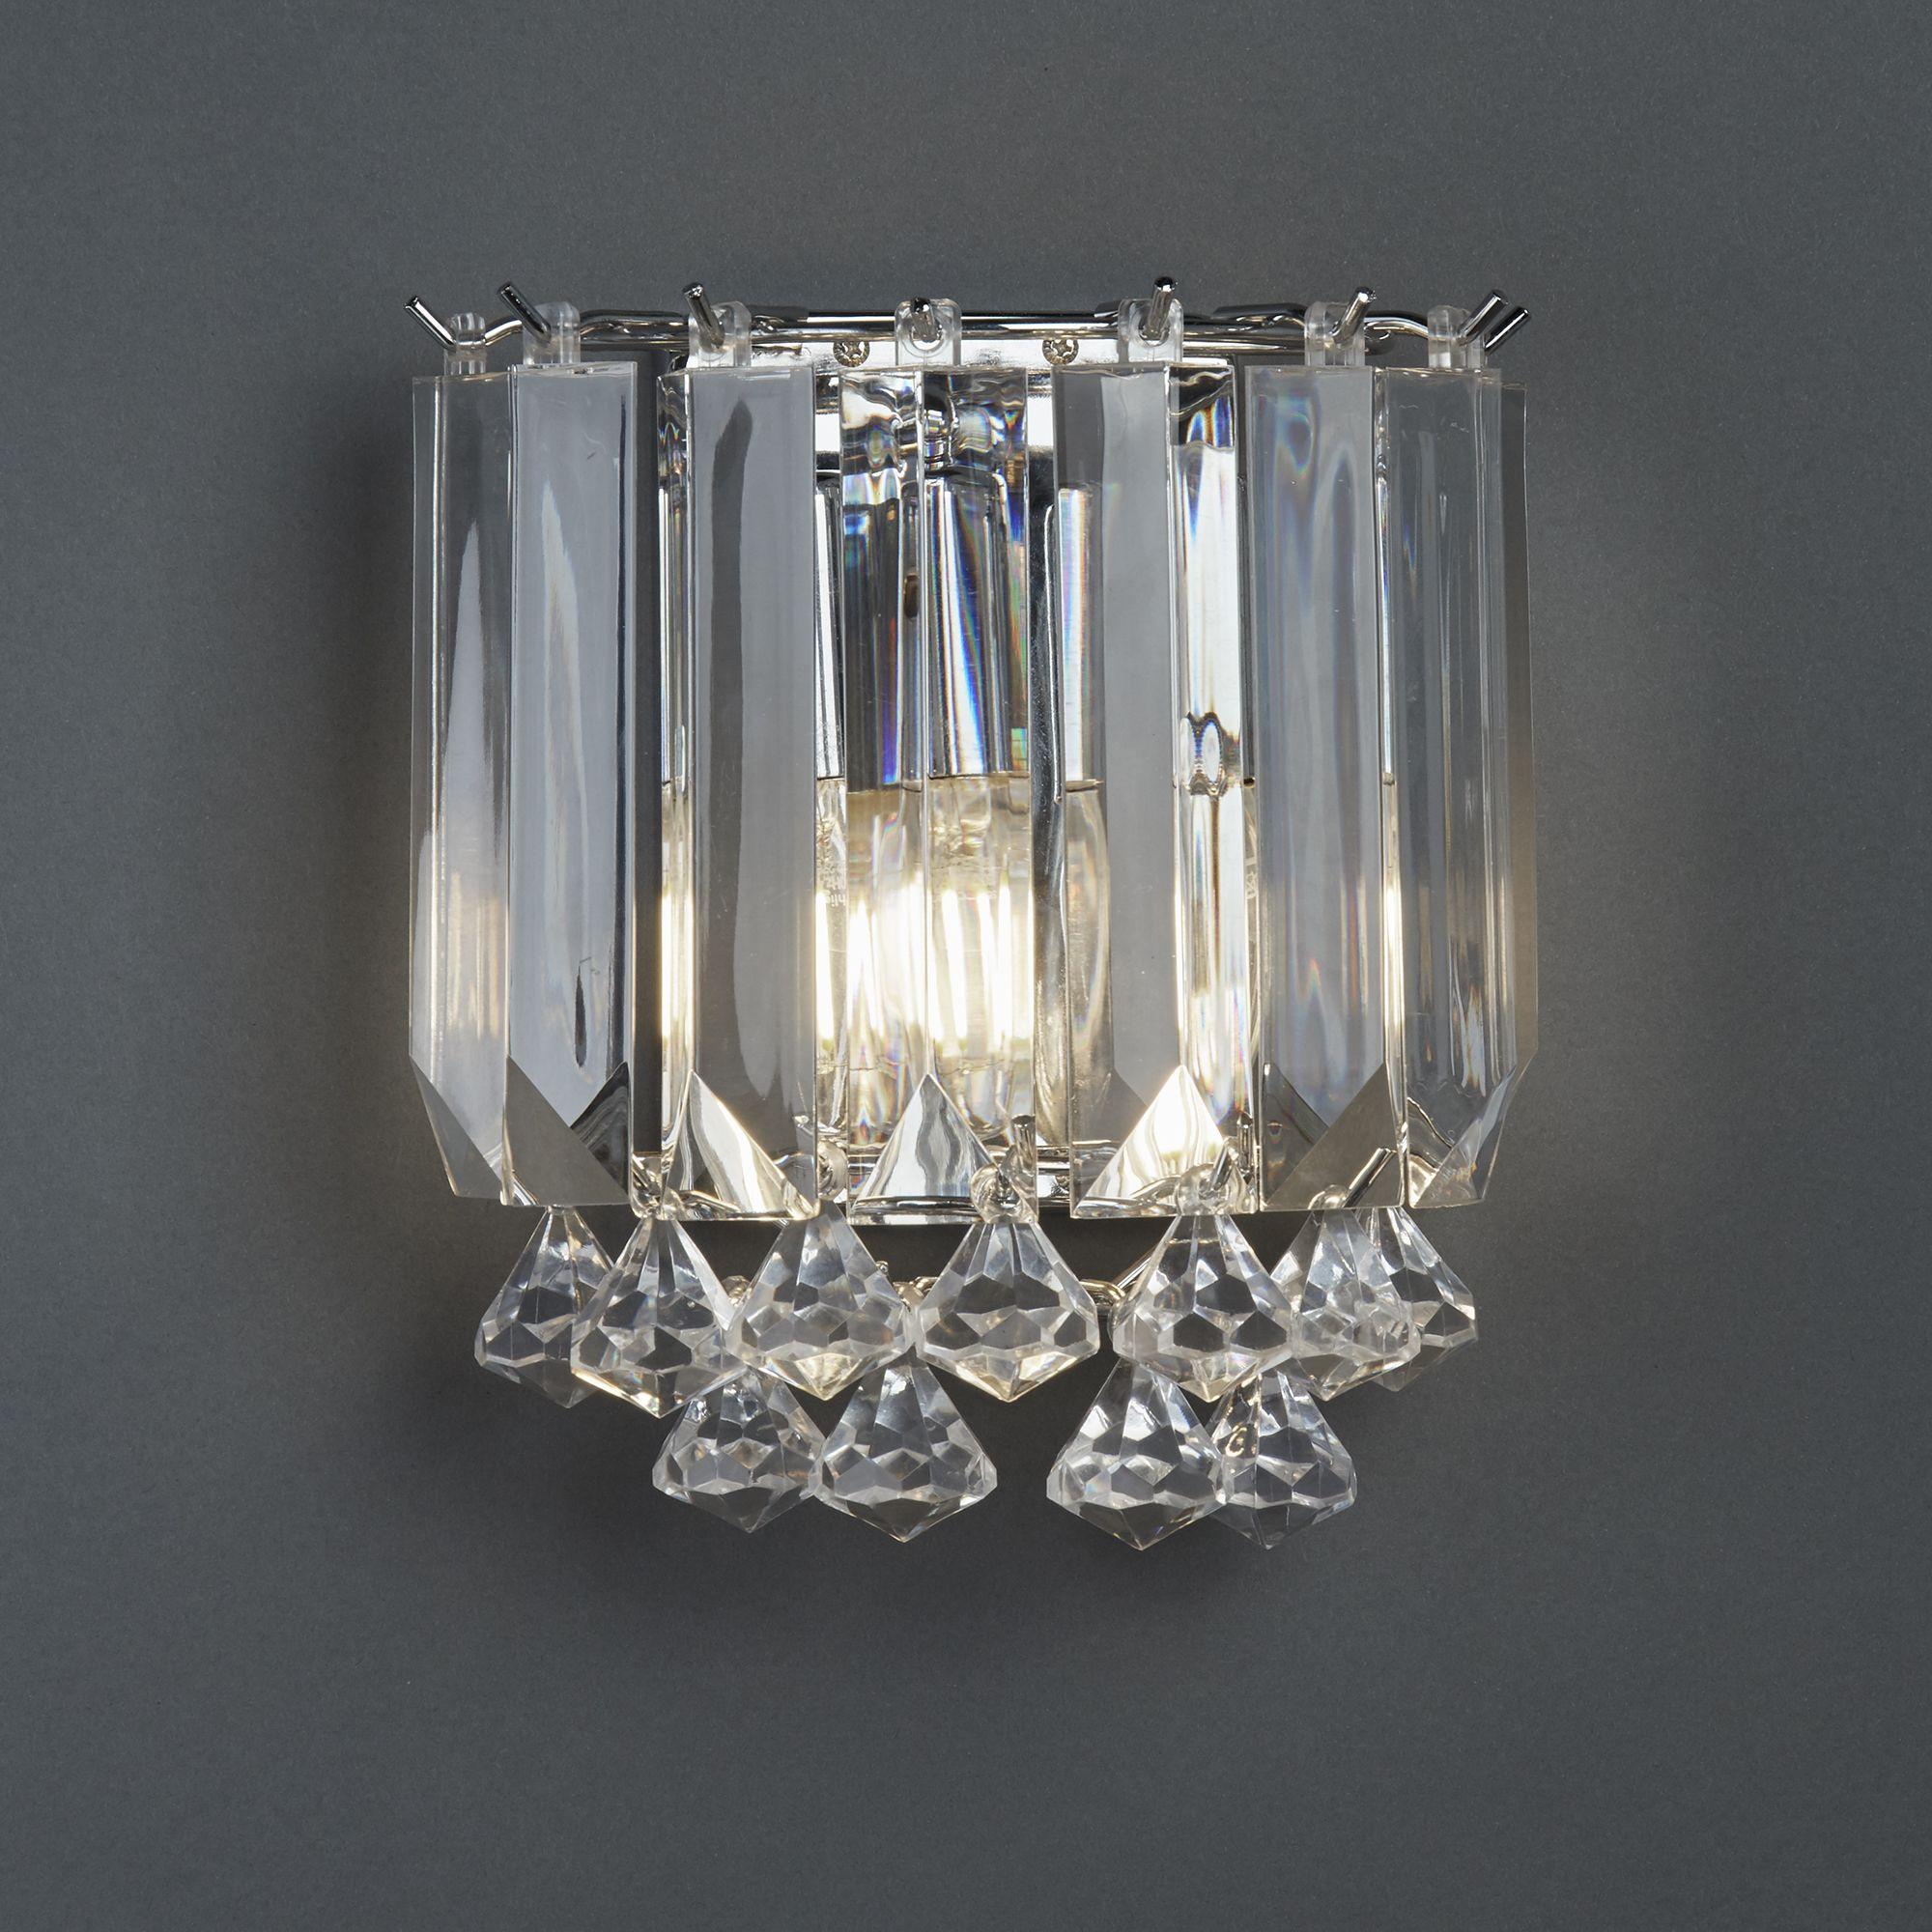 Sigma Chrome 2 Light Wall Bracket With Clear Acrylic Crystal Prisms Balls